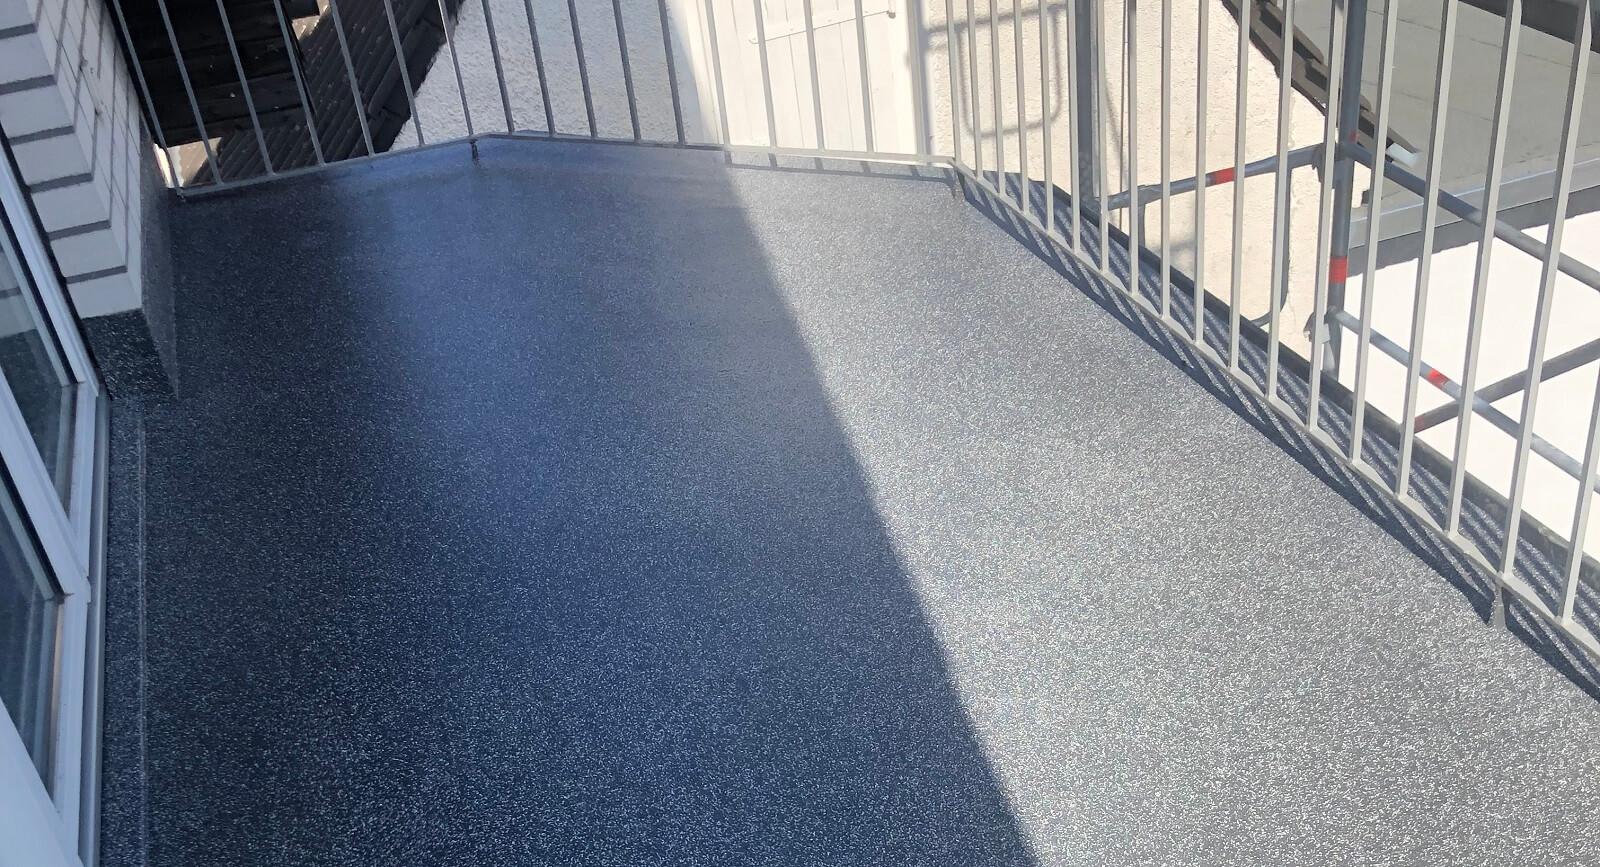 Balkonsanierung in Duisburg – Estrich aus Zementfaserplatten